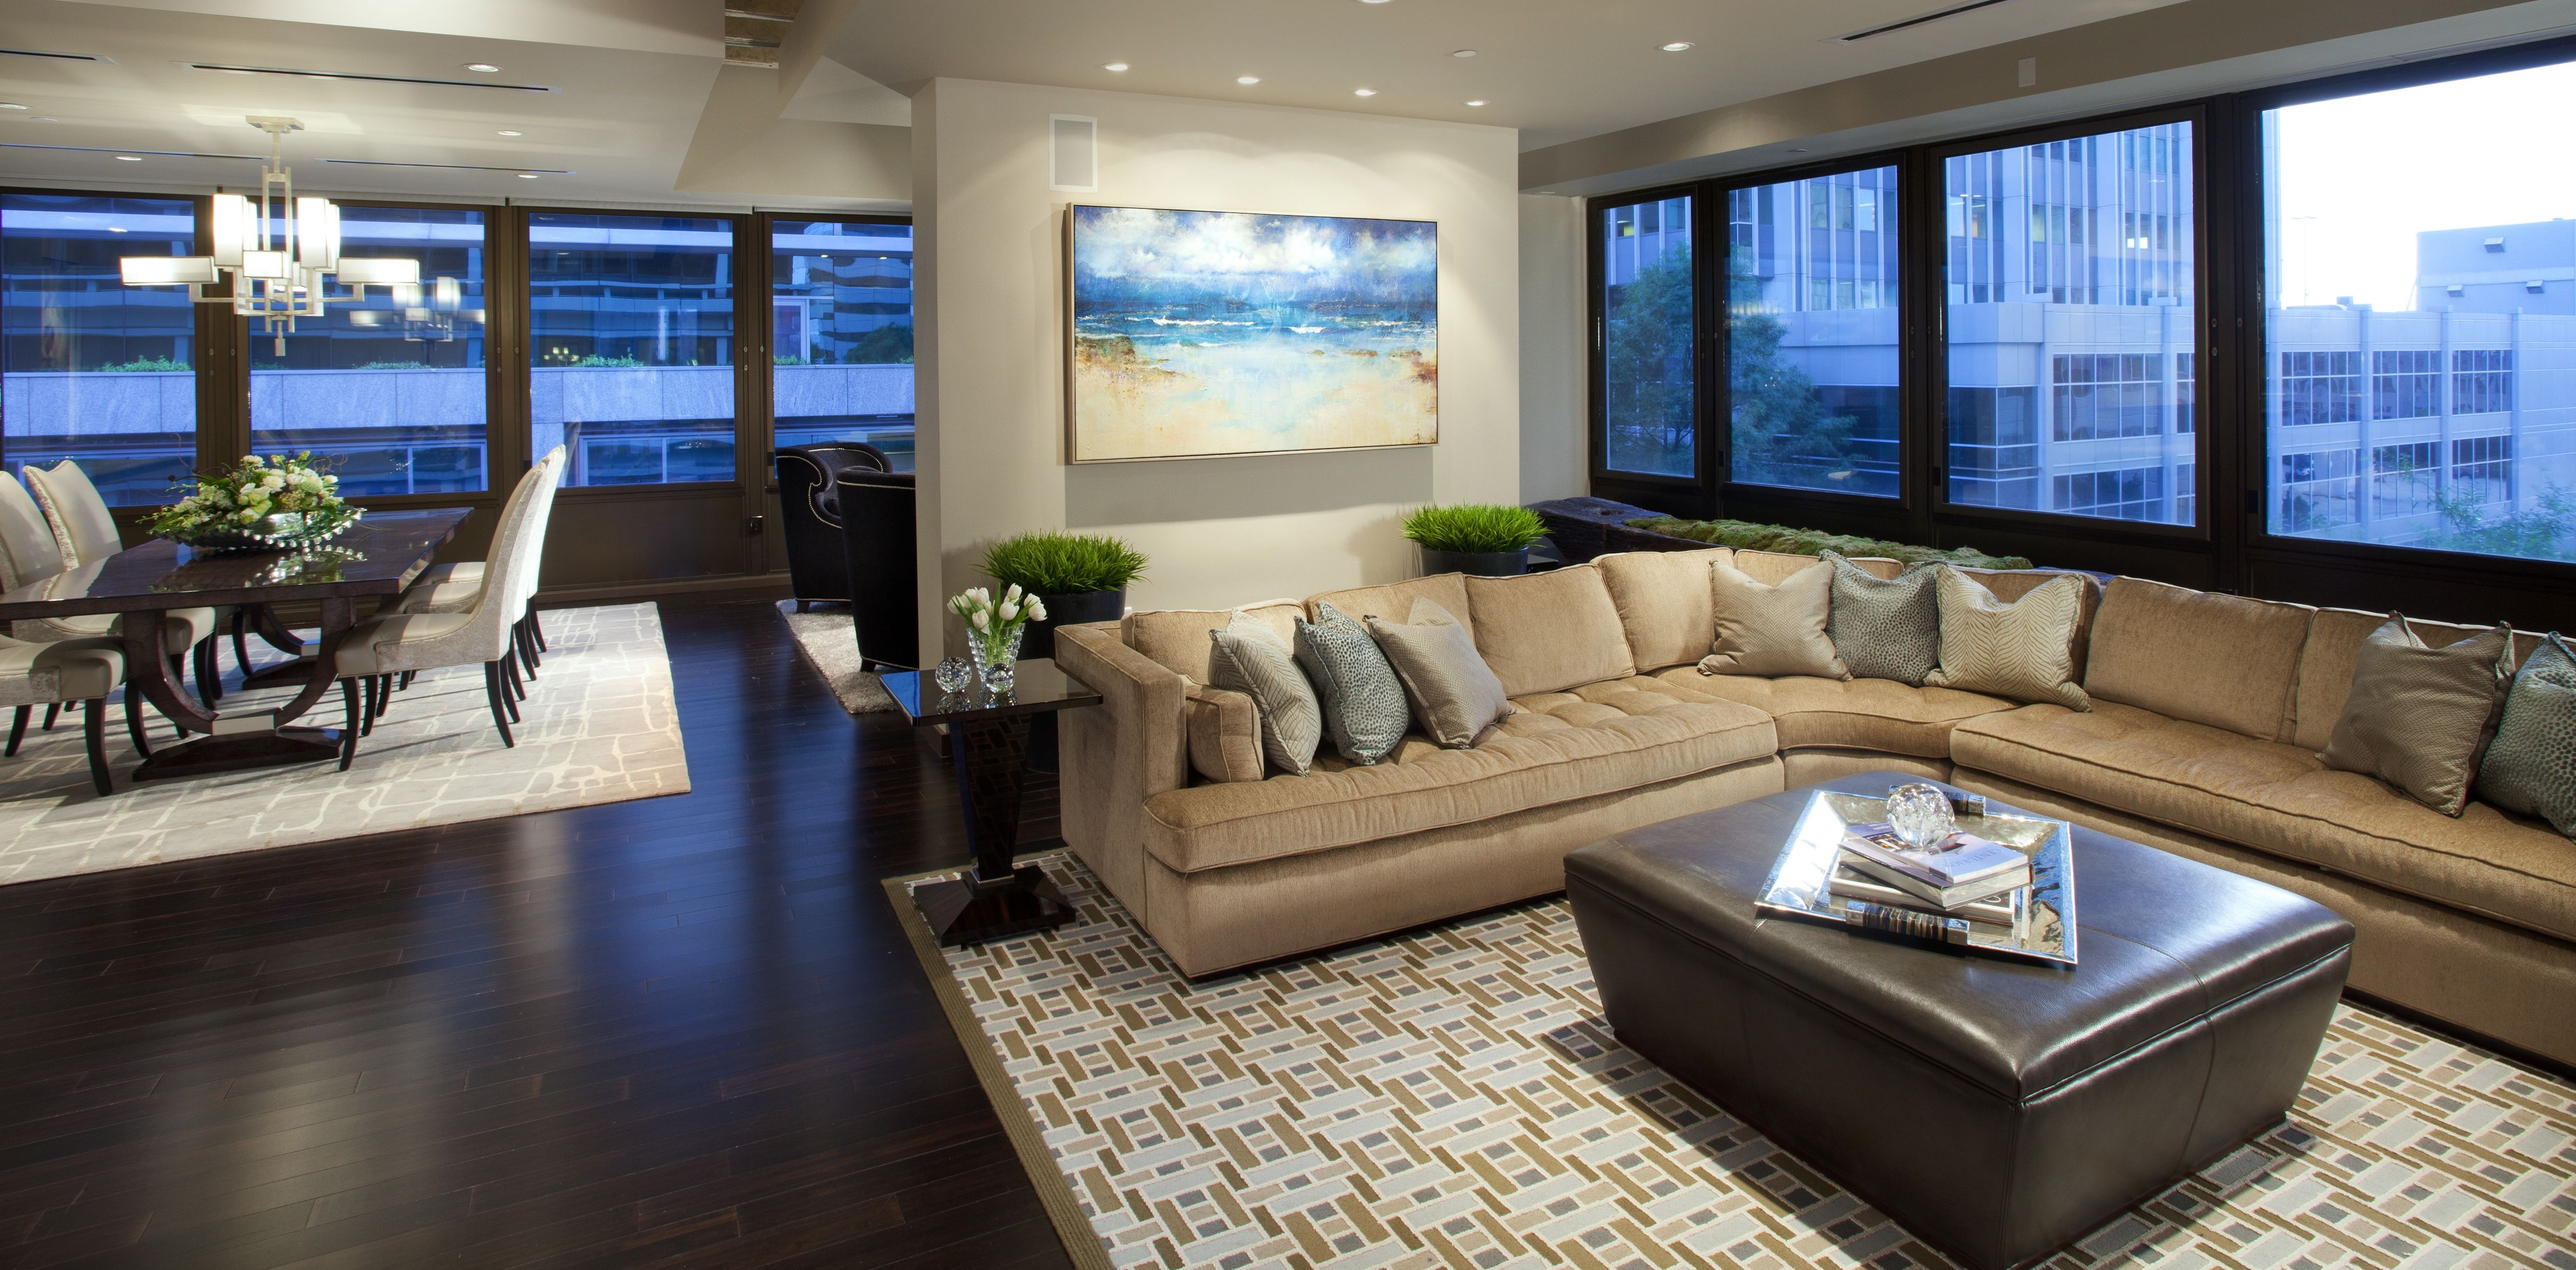 Lana Helda Design Jim Schmid Photography Home Decor Decor Home